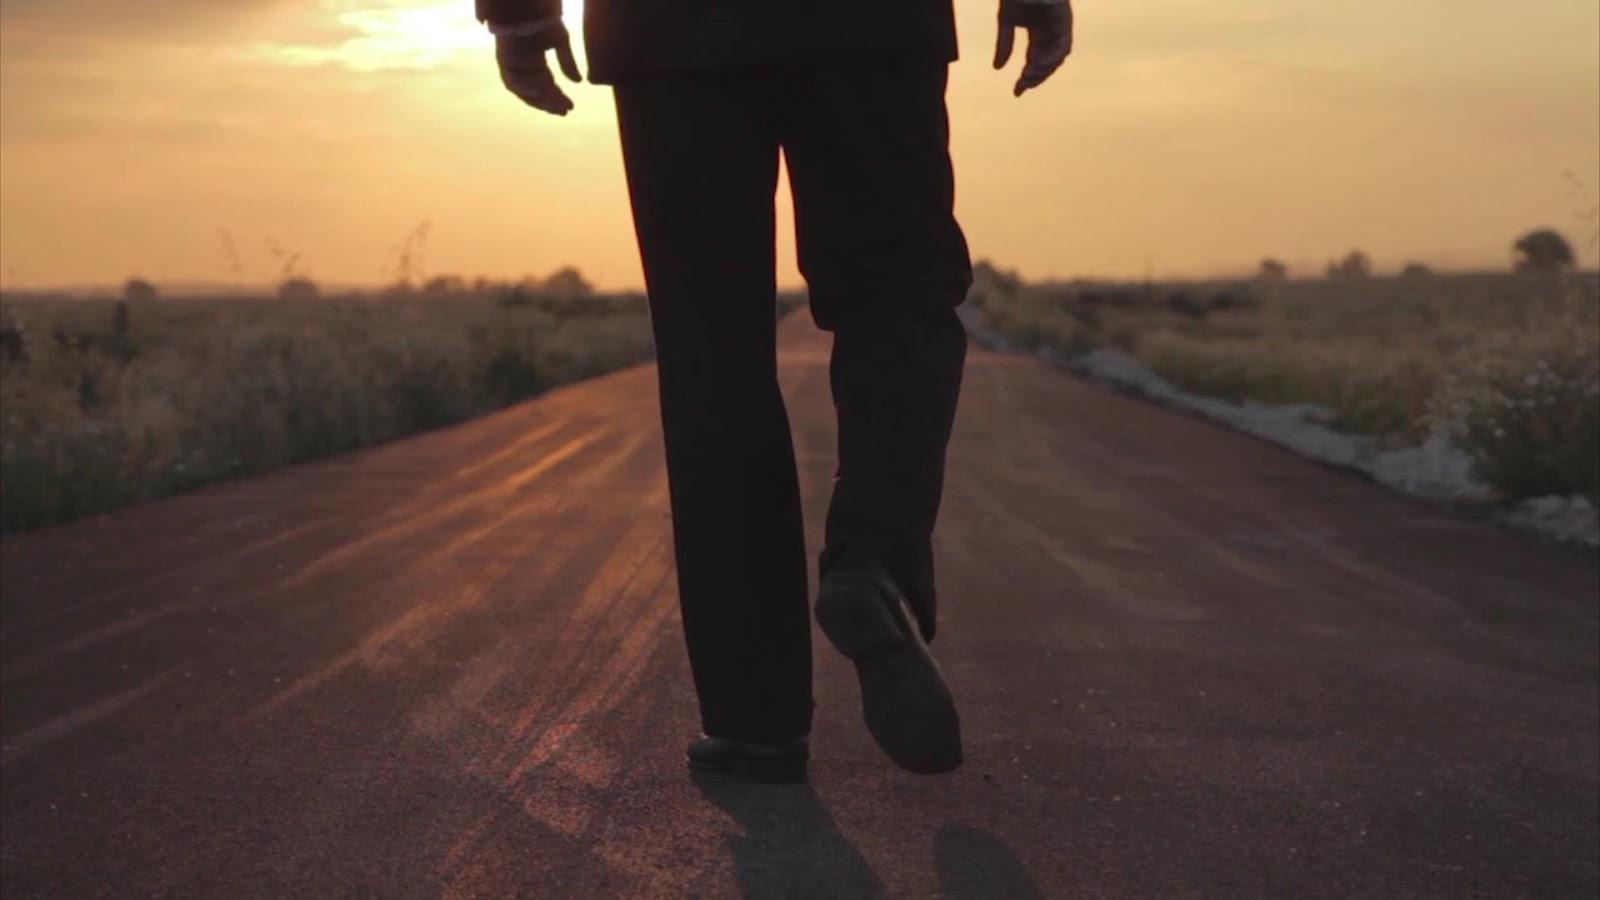 MBTI enneagram type of Striking your own path